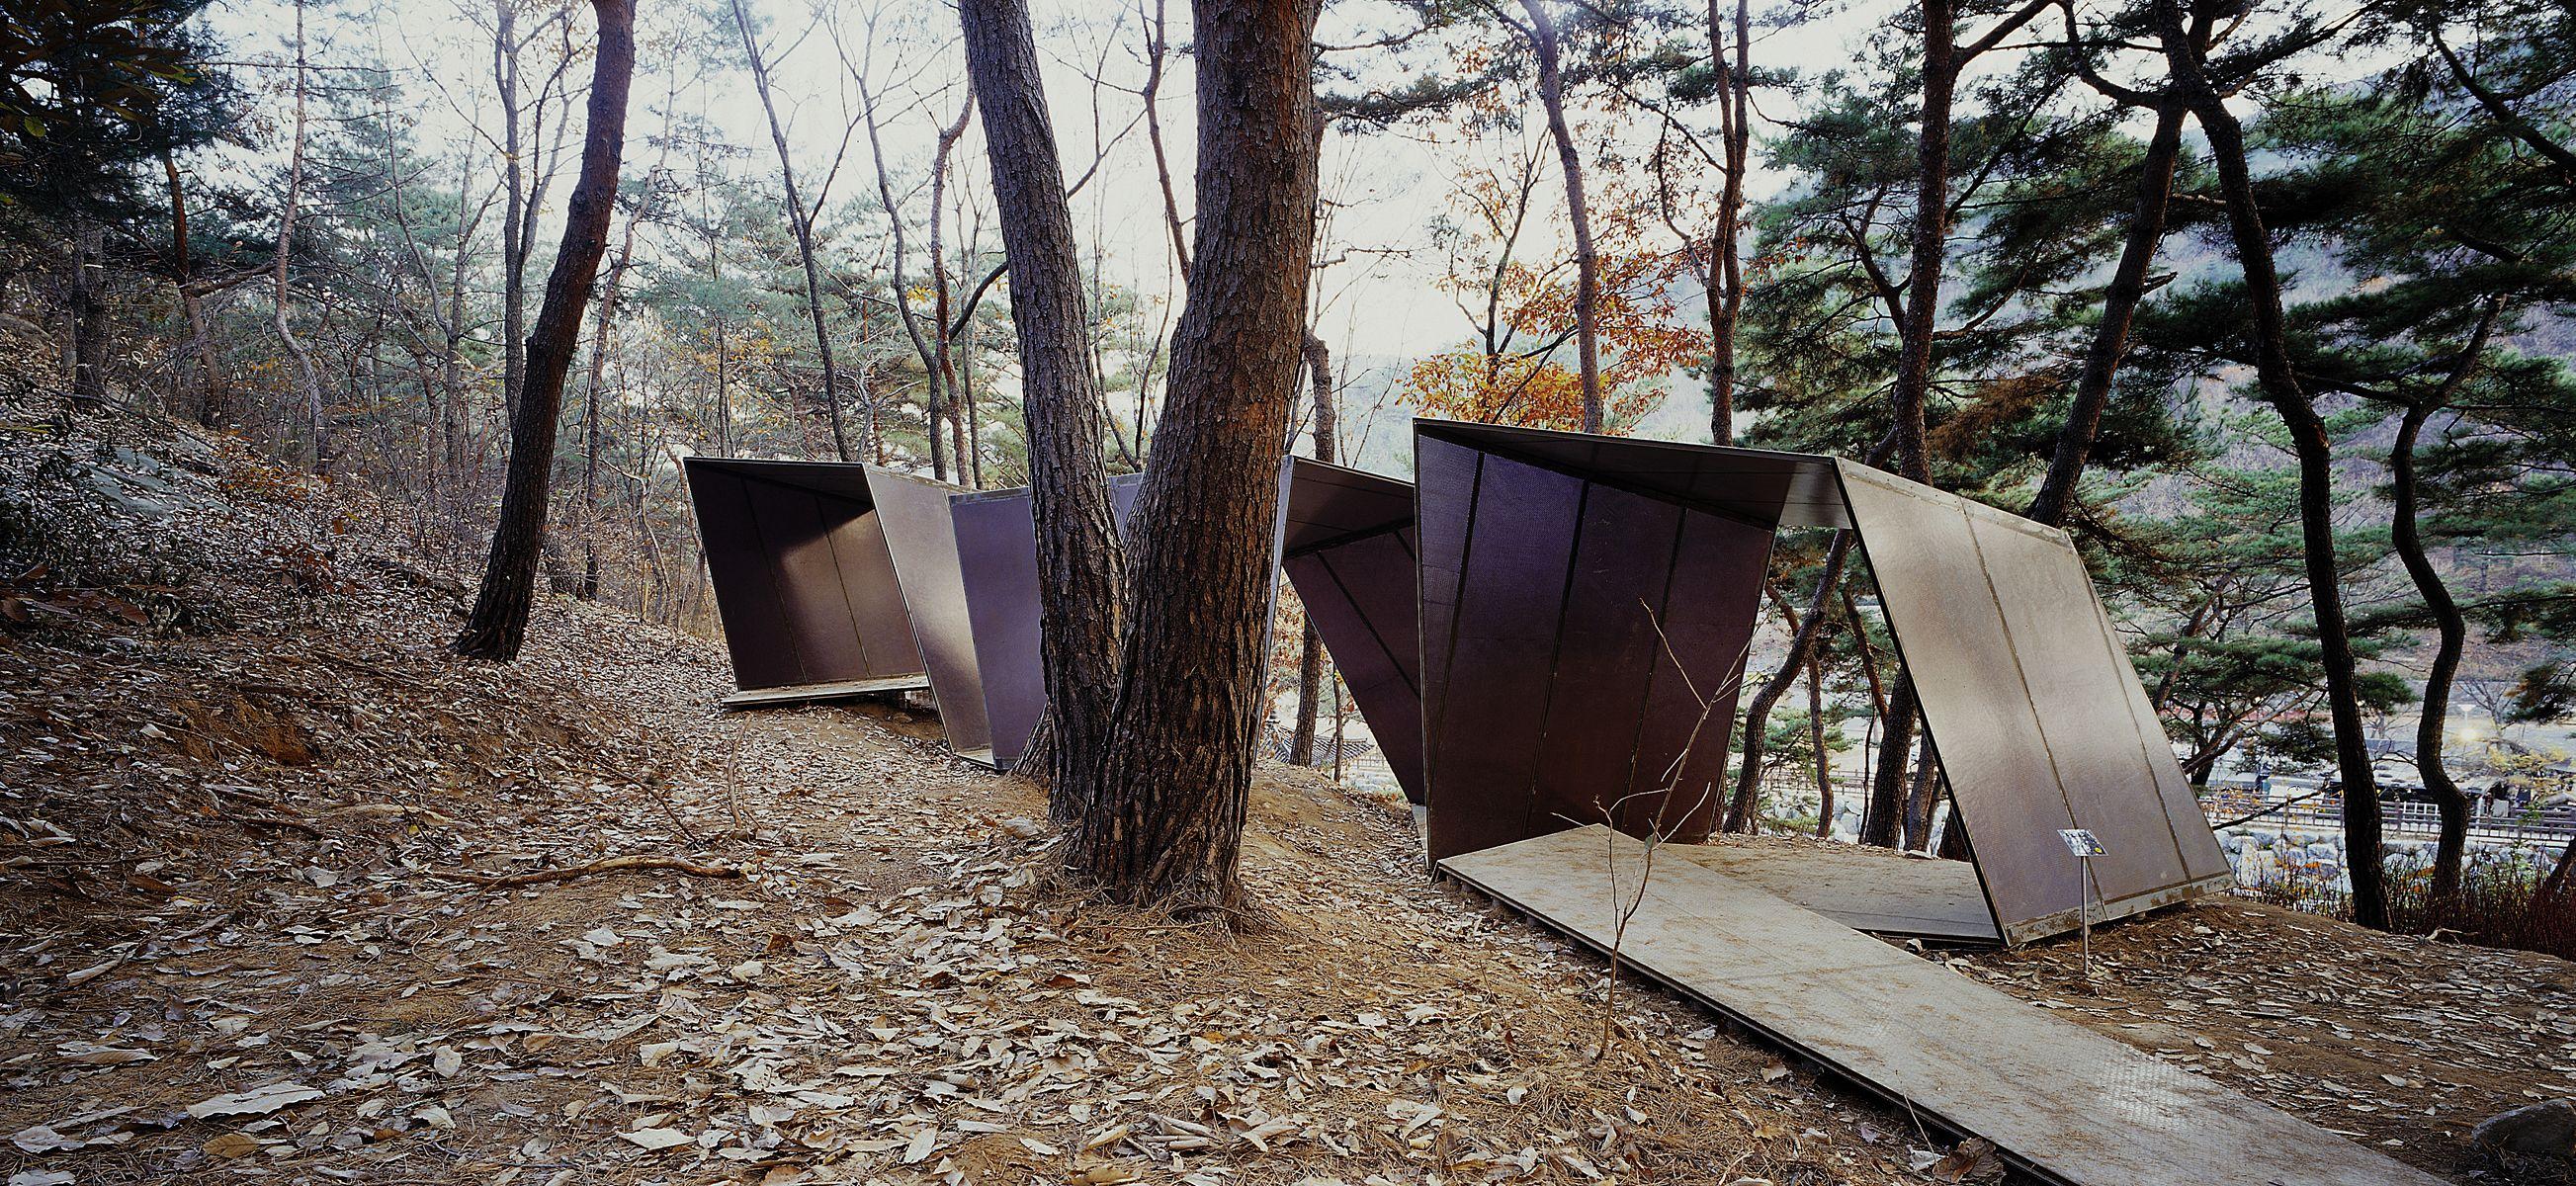 Exhibition | Kengo Kuma and Associates | Архитектура ...